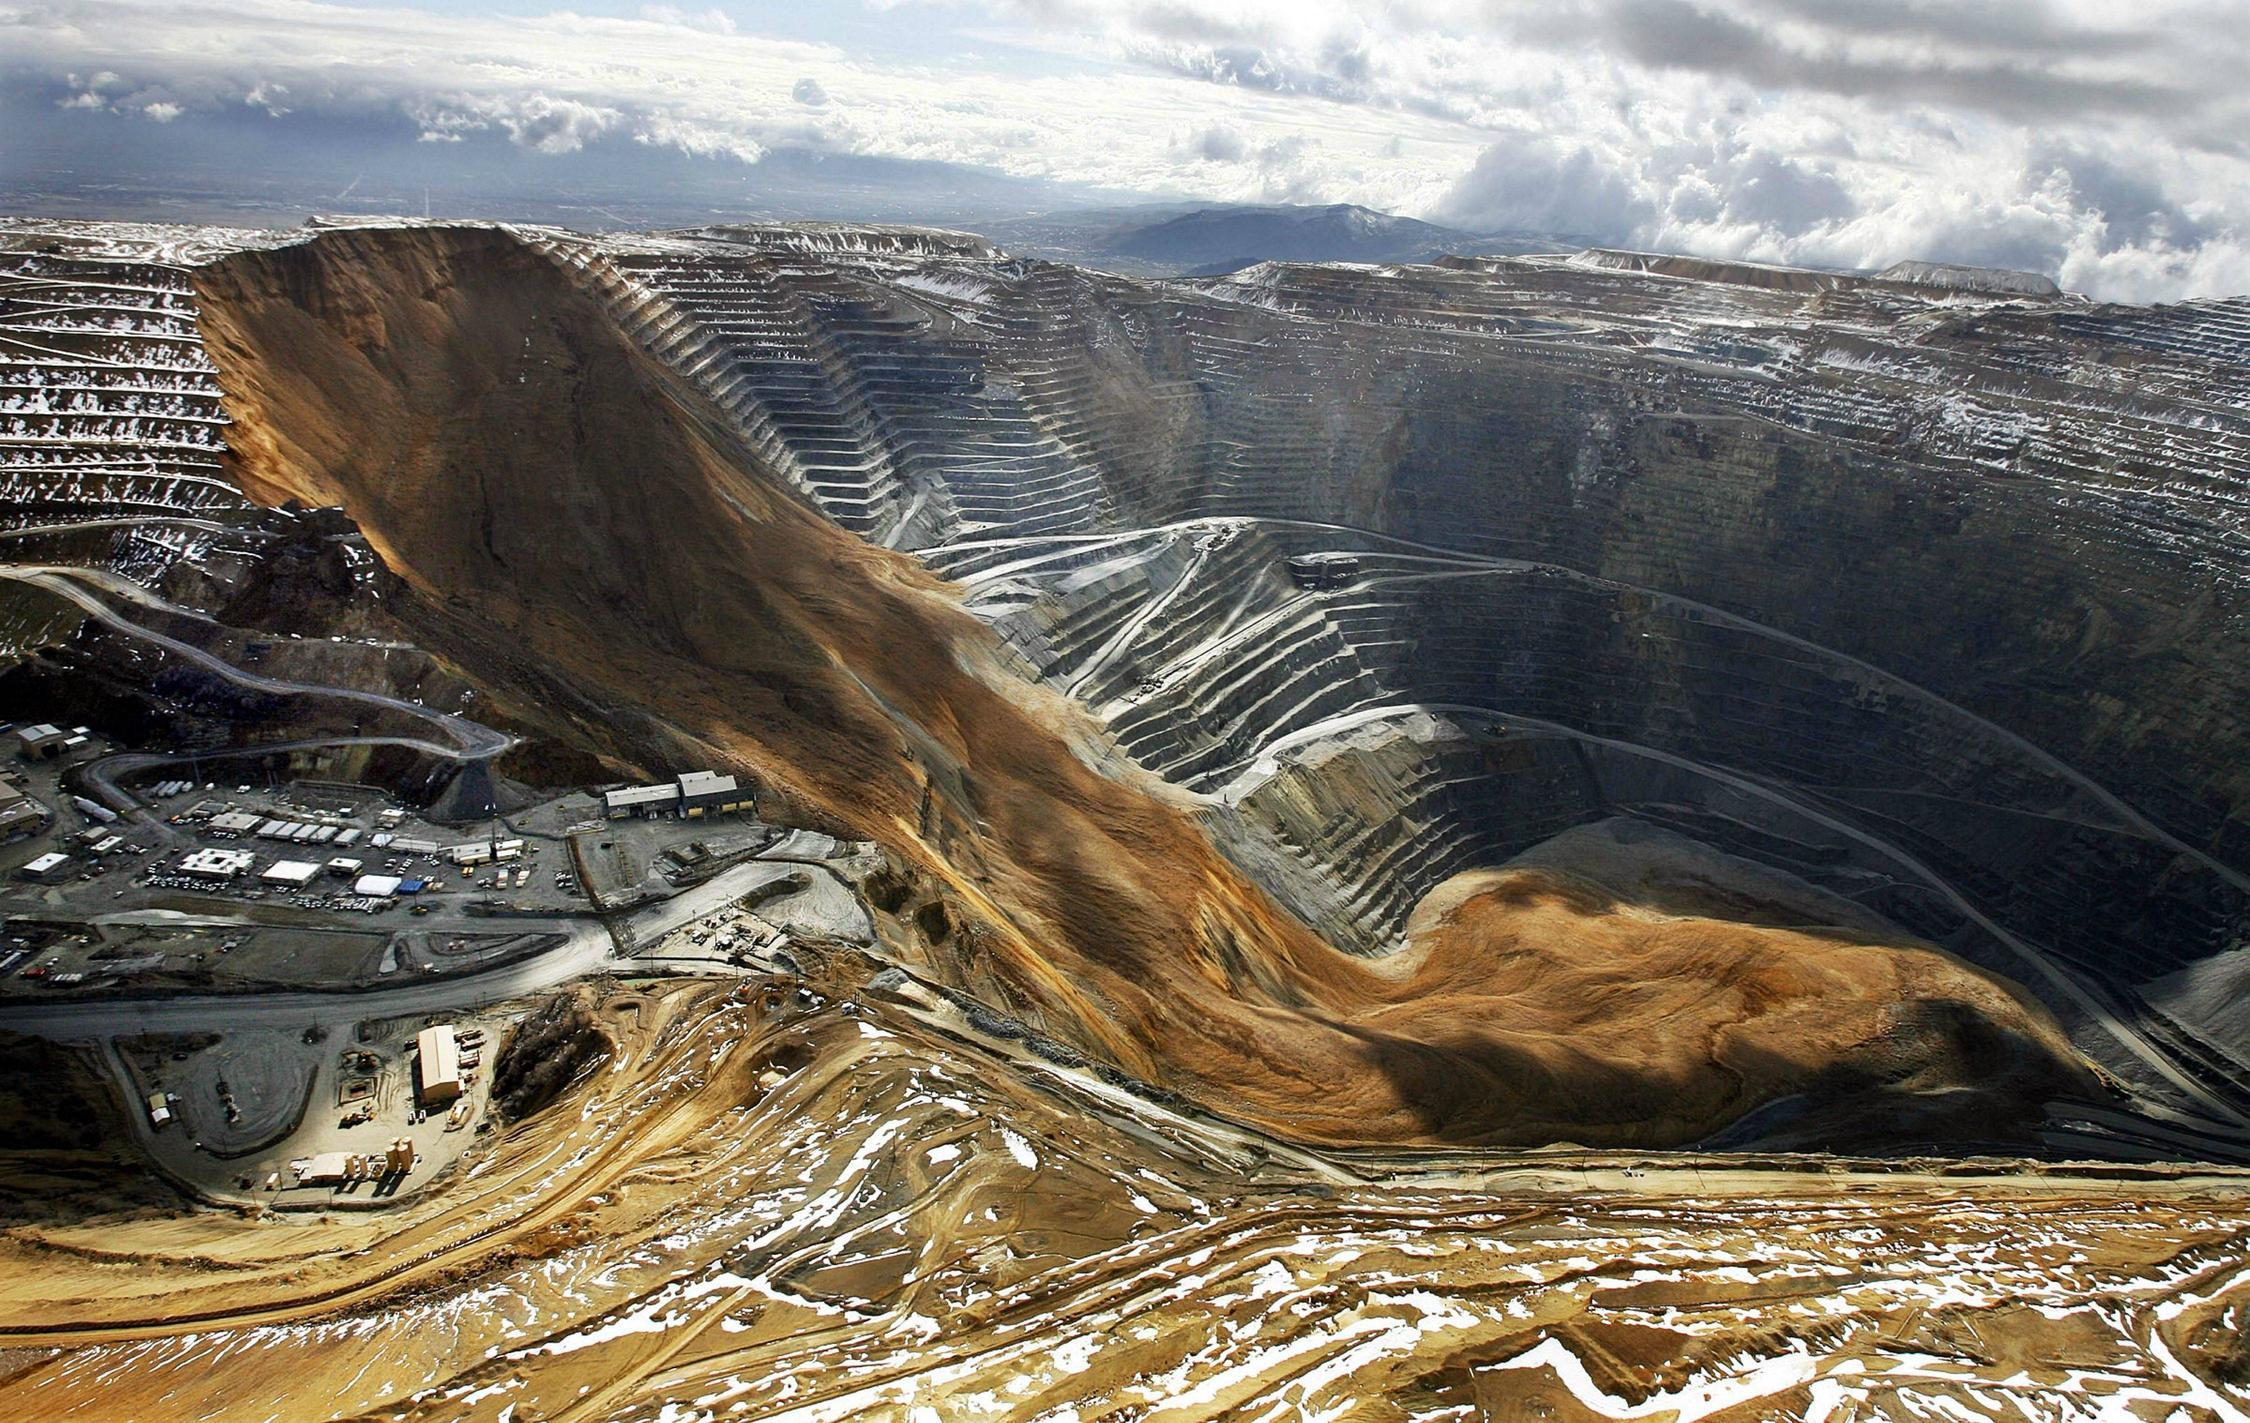 land slide, high resolution, kennecott utah copper's bingham canyon mine